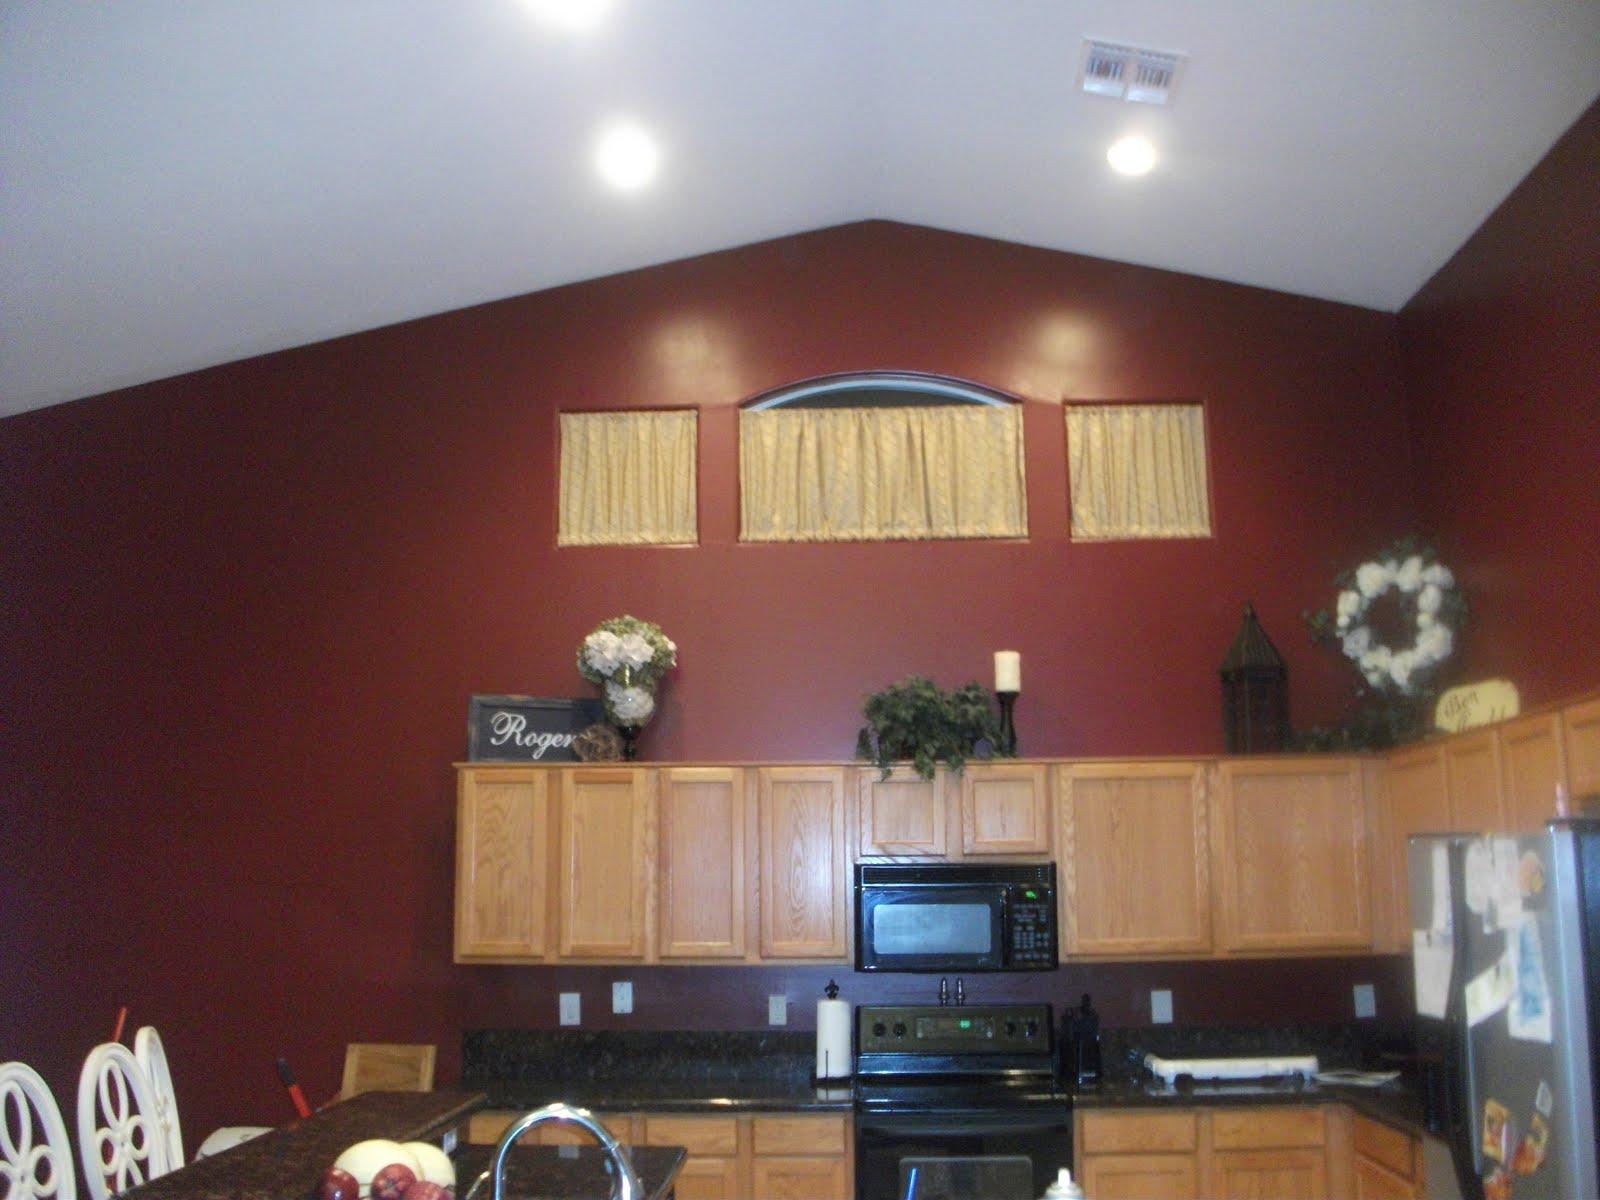 http://4.bp.blogspot.com/_loyeRYIJx4E/TKAMSTUkfwI/AAAAAAAABe0/Wy6xX_Q7Pgw/s1600/kitchen+001.JPG